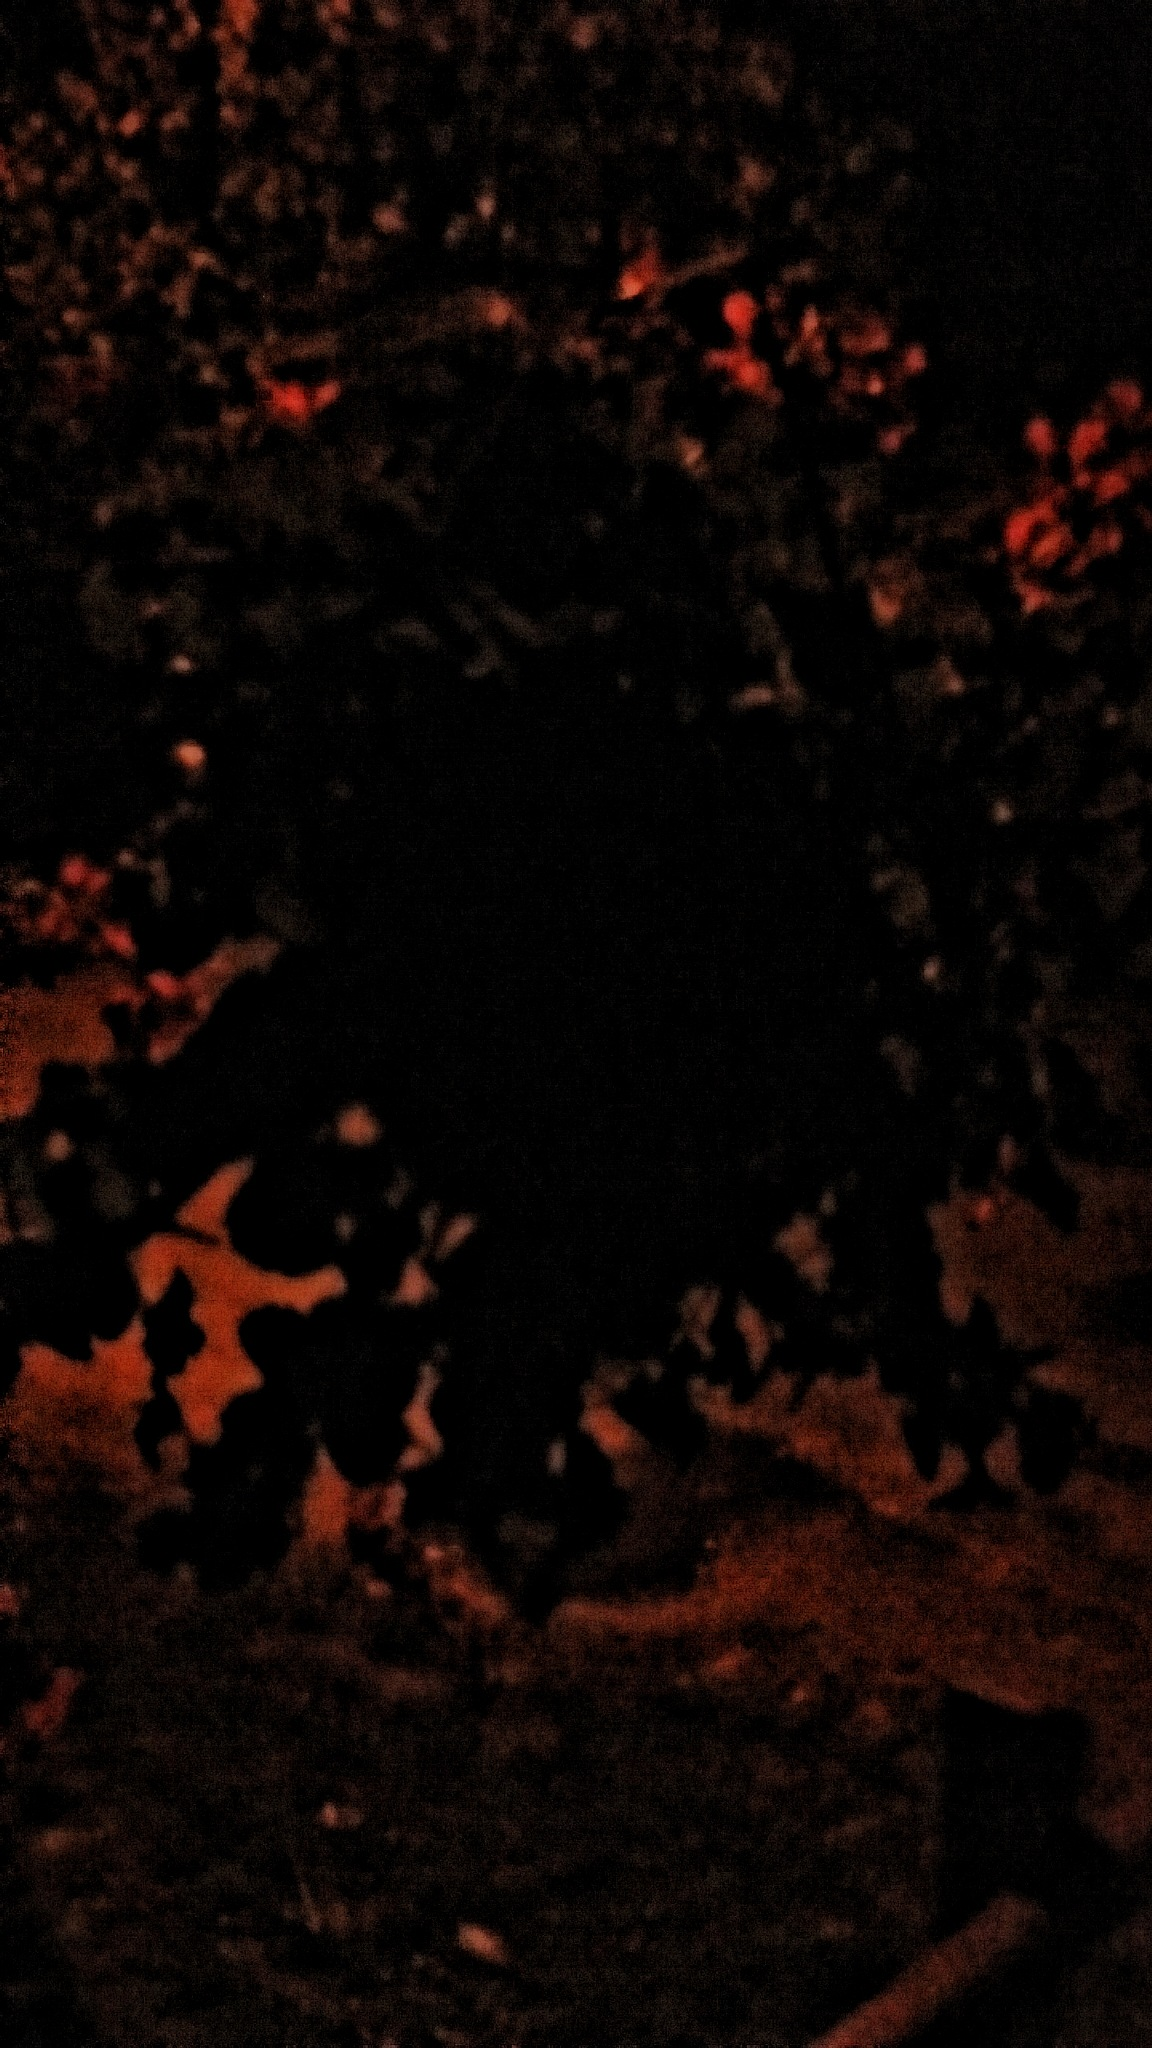 nightime 1 by Mark Barecki